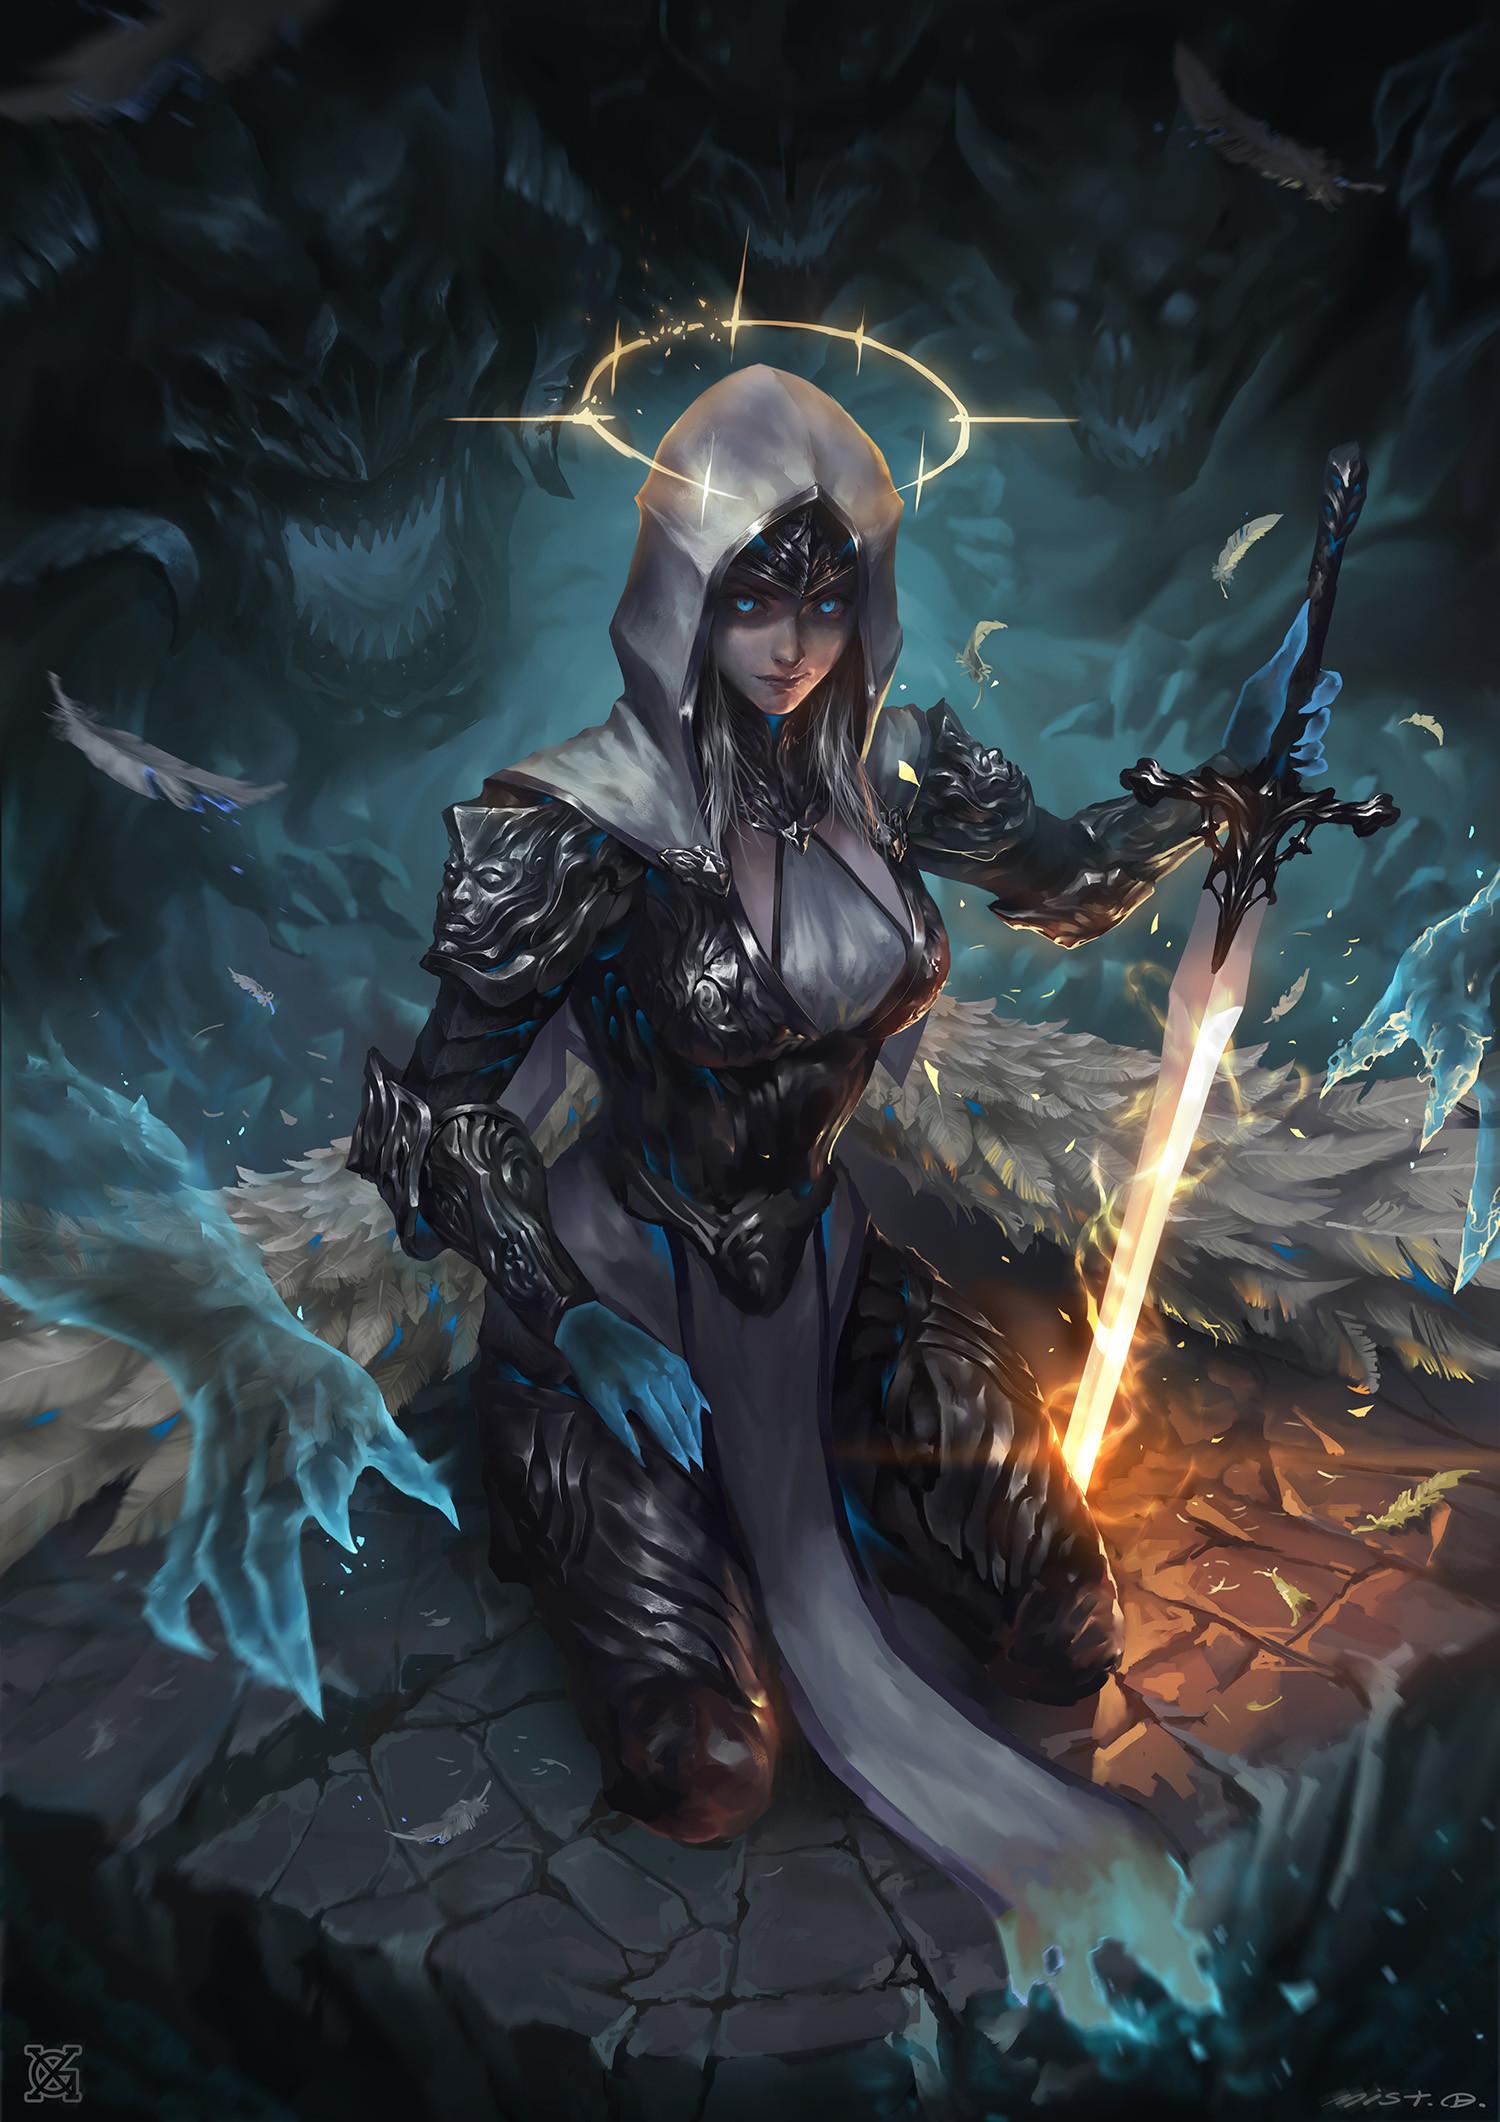 Artstation - Dark Angel Mist Xg